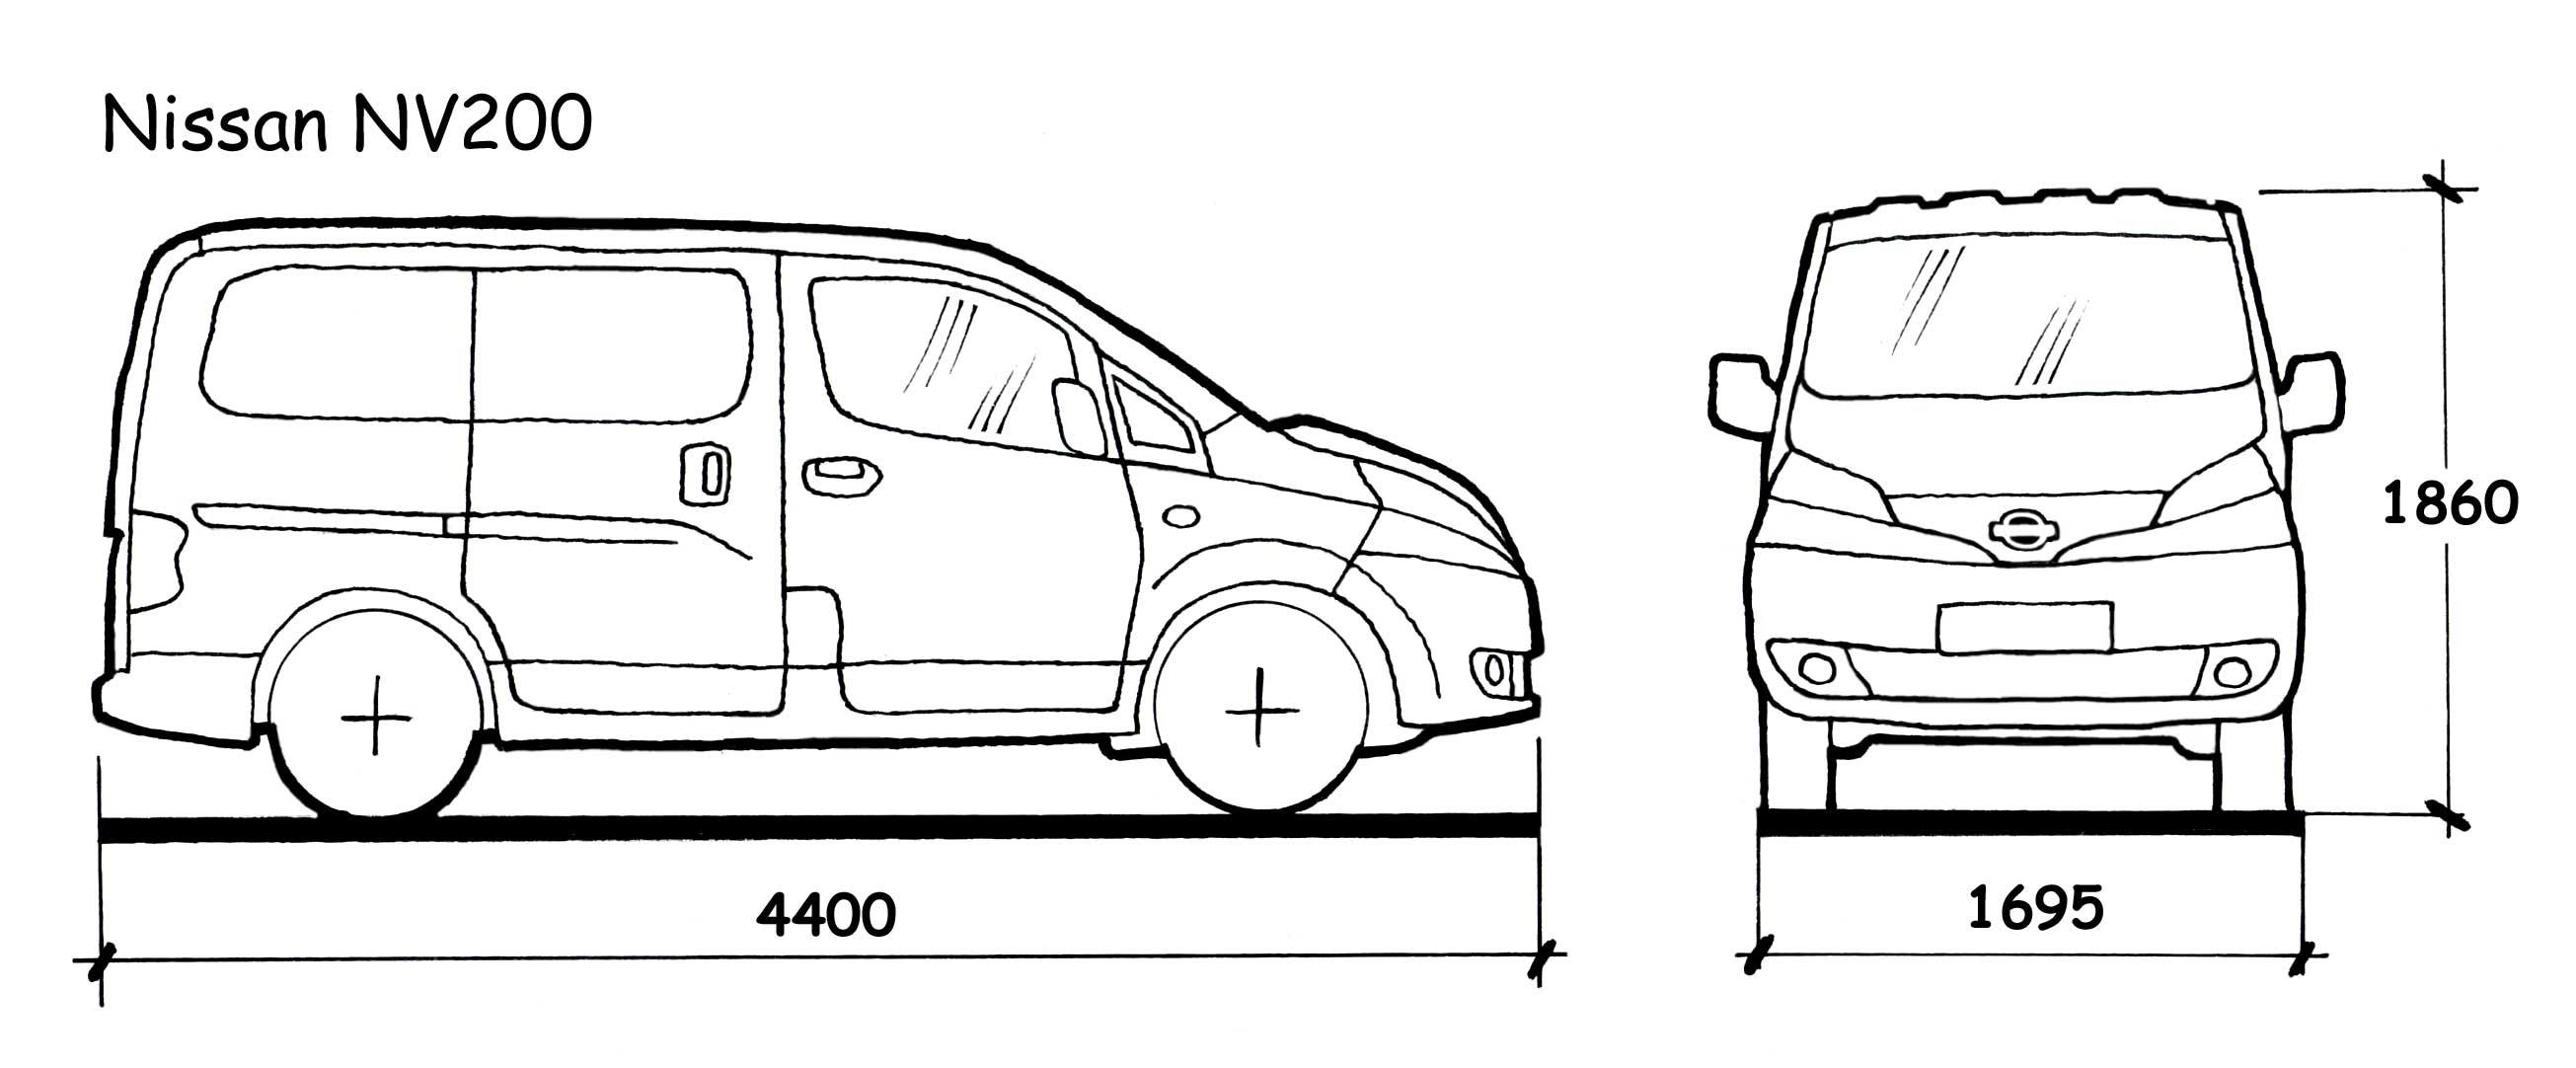 Fuse Box Diagram Nissan Nv Nissan Auto Wiring Diagram